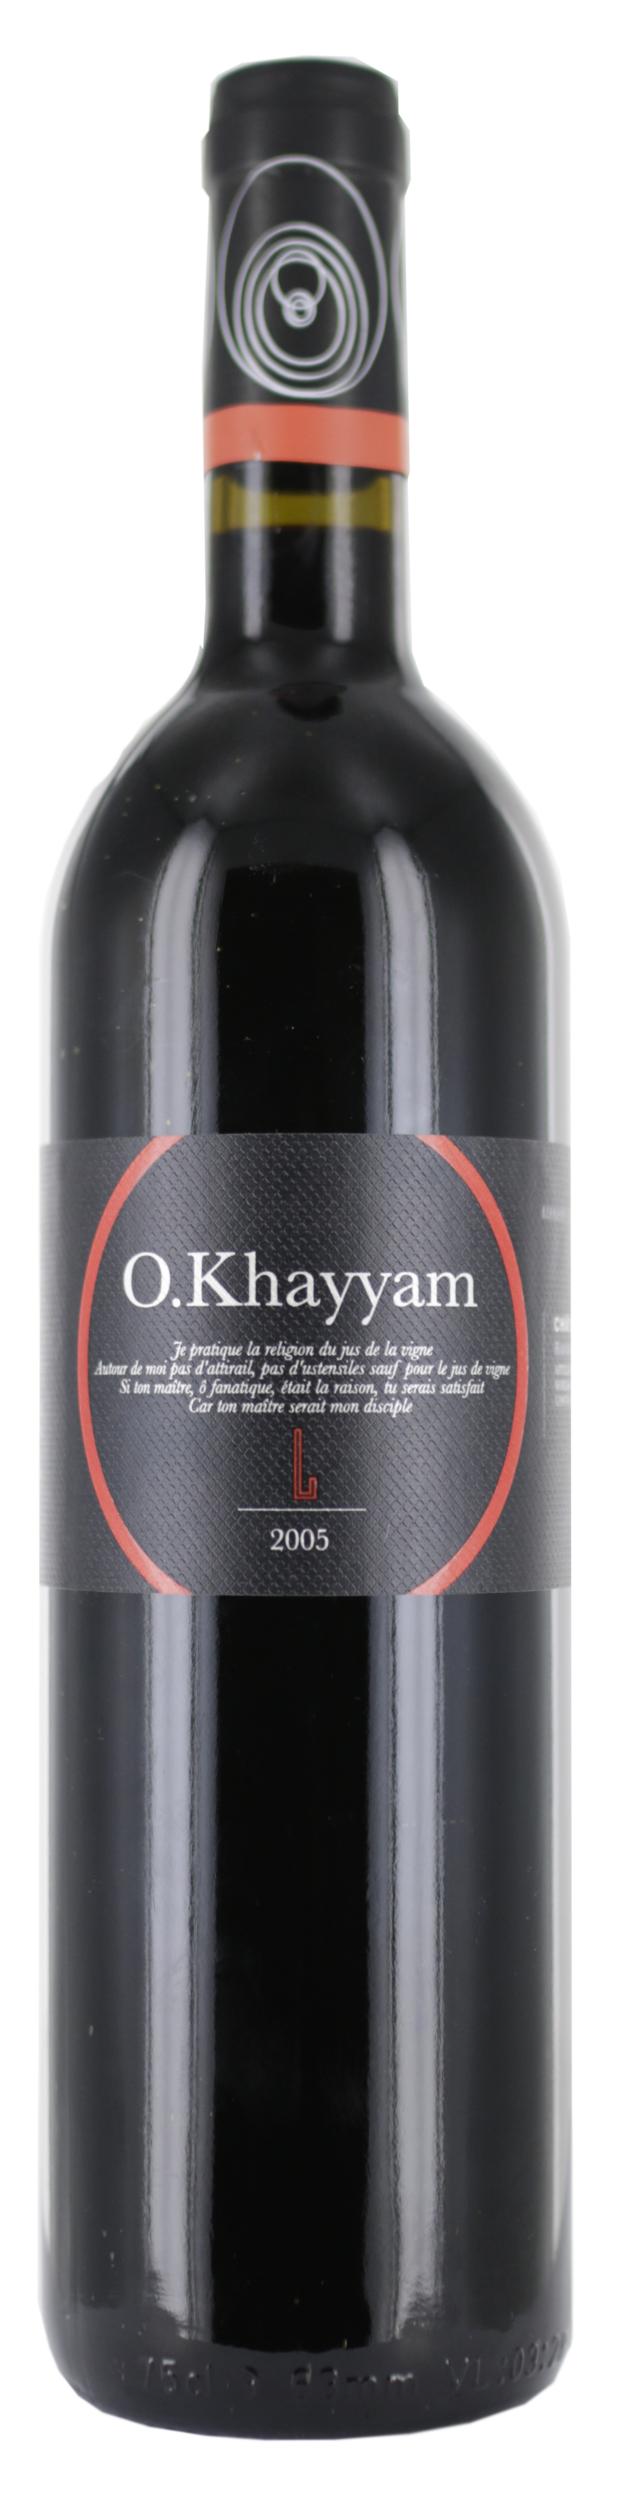 Bordeaux Superieur - Omar Khayyam - Château L\'Escart - 2005 - BIO